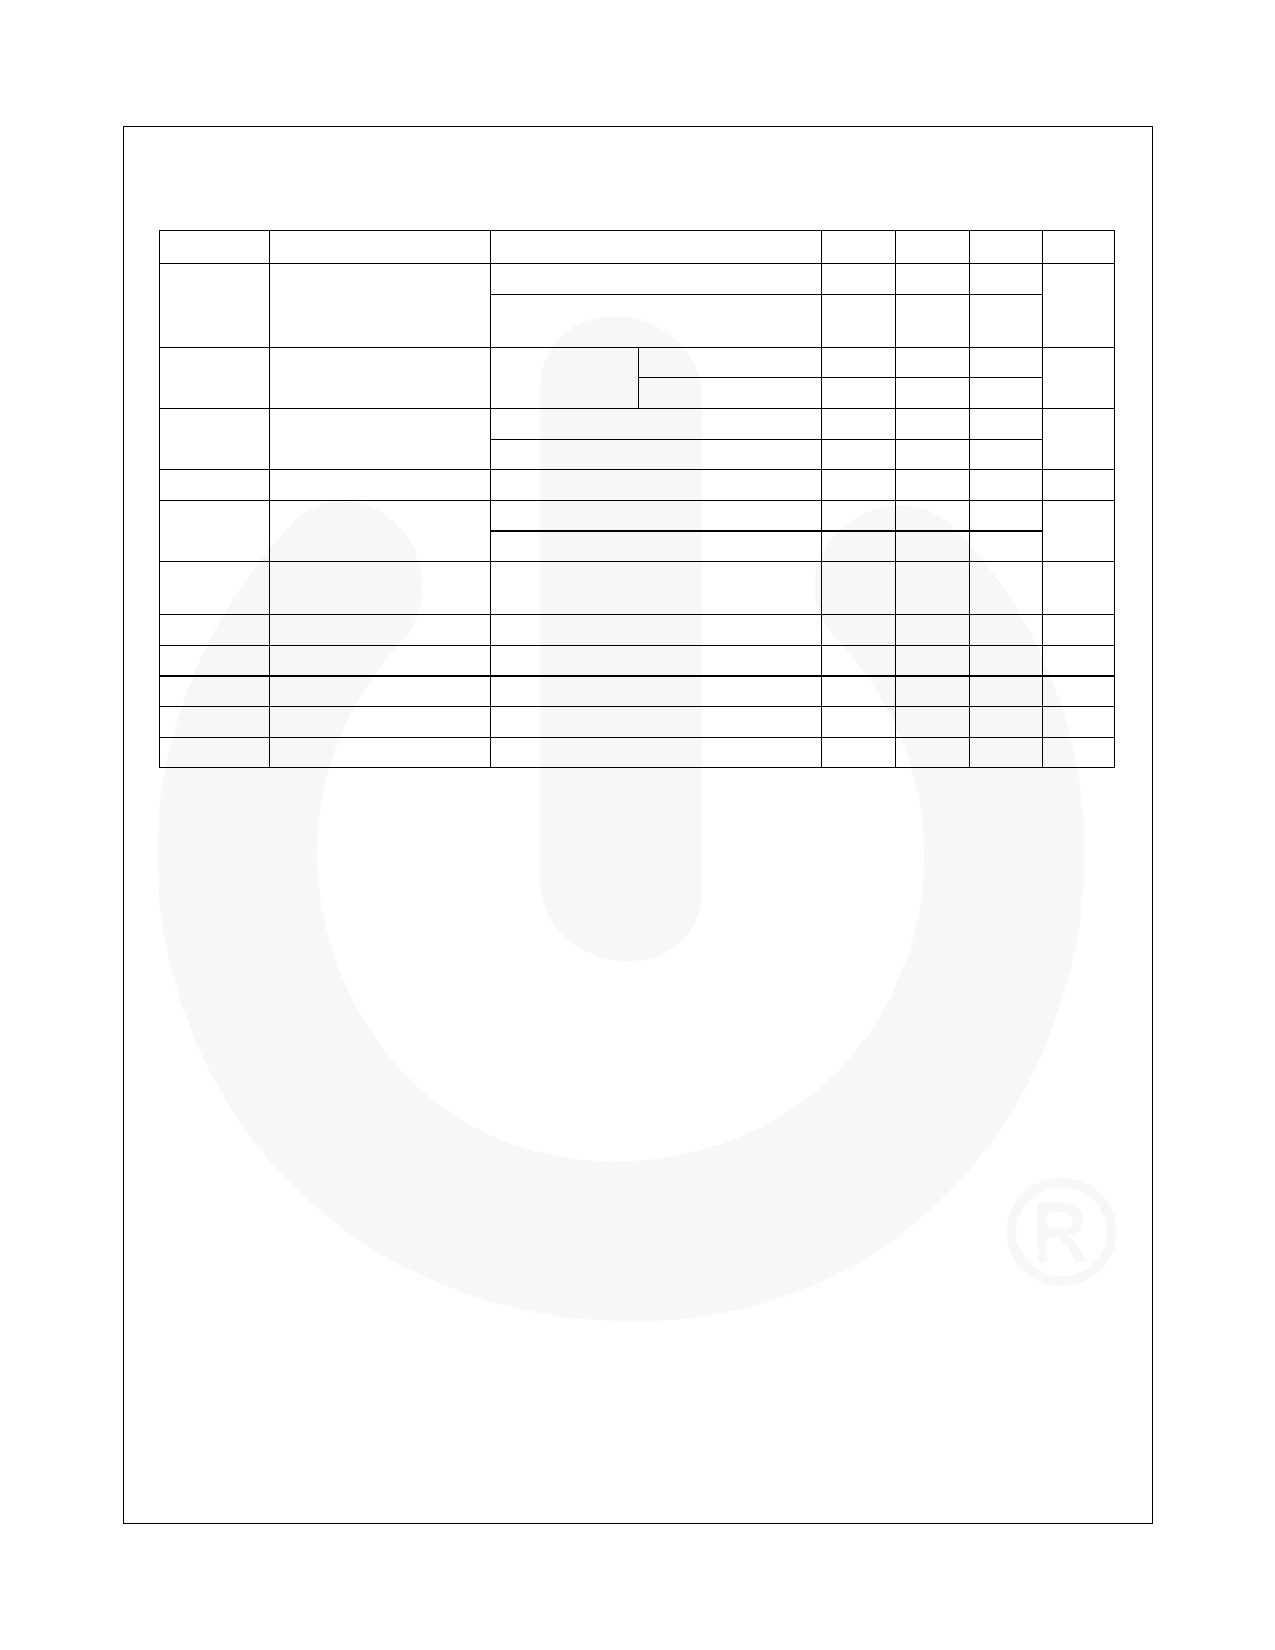 KA7905 pdf, ピン配列